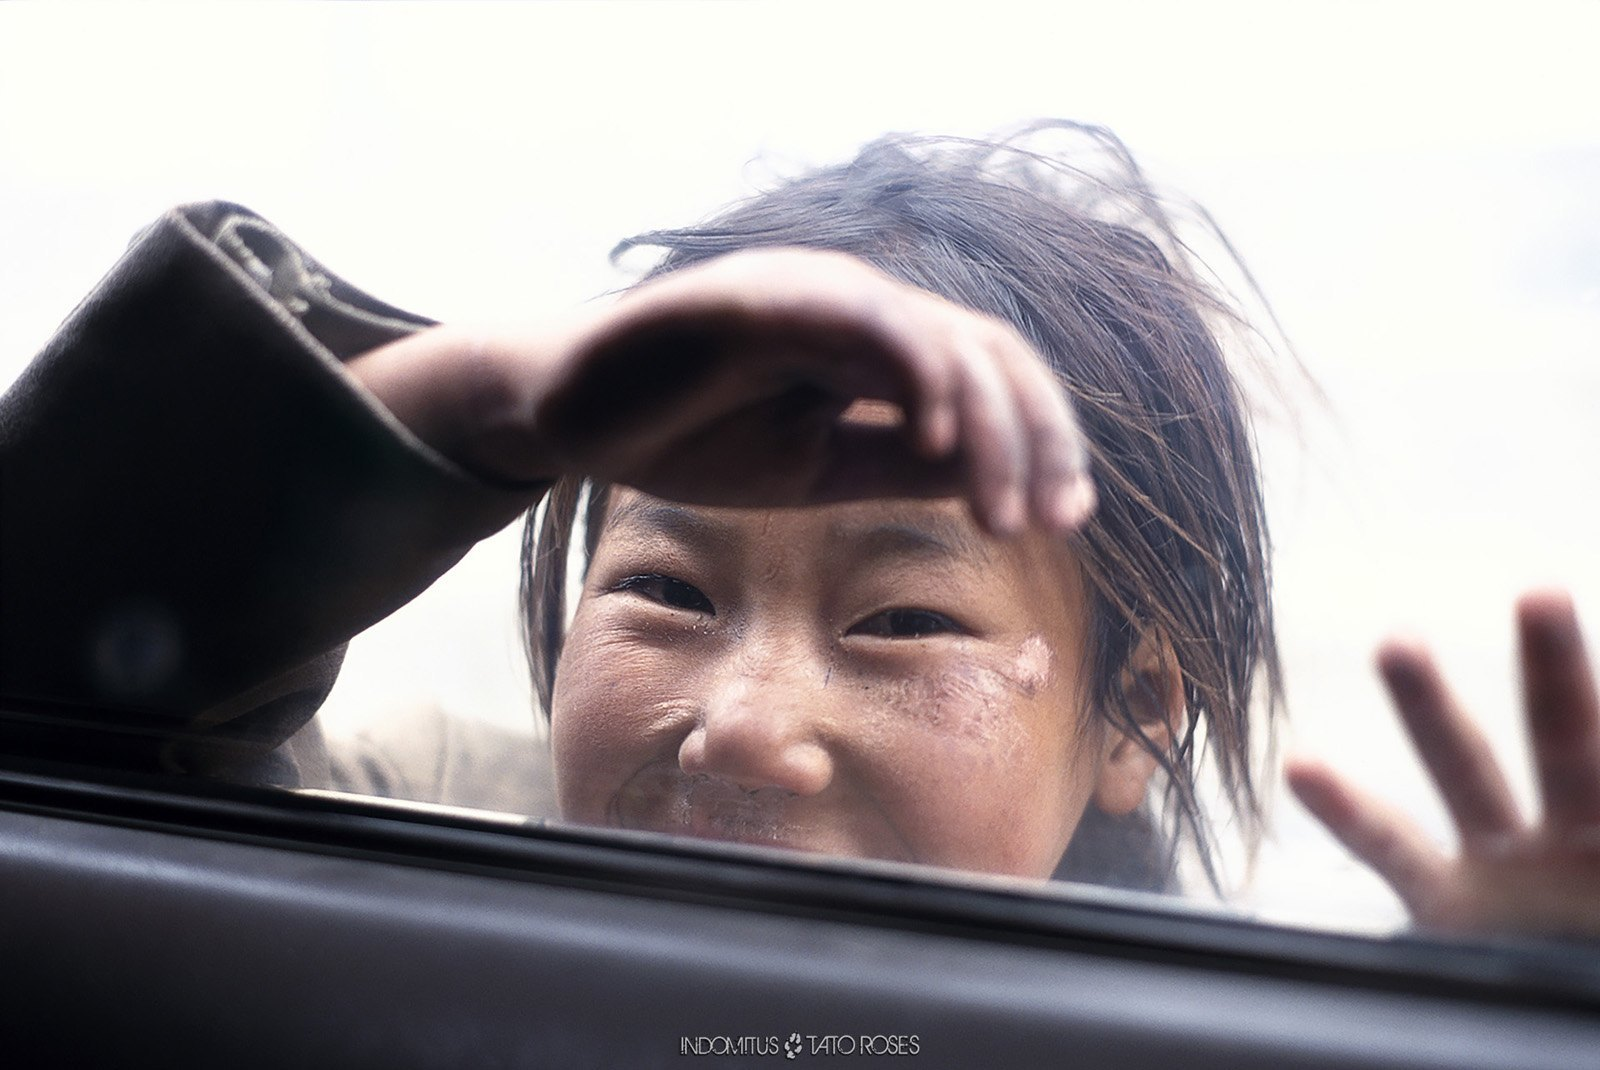 Tíbet Indomitus Tato Rosés 30